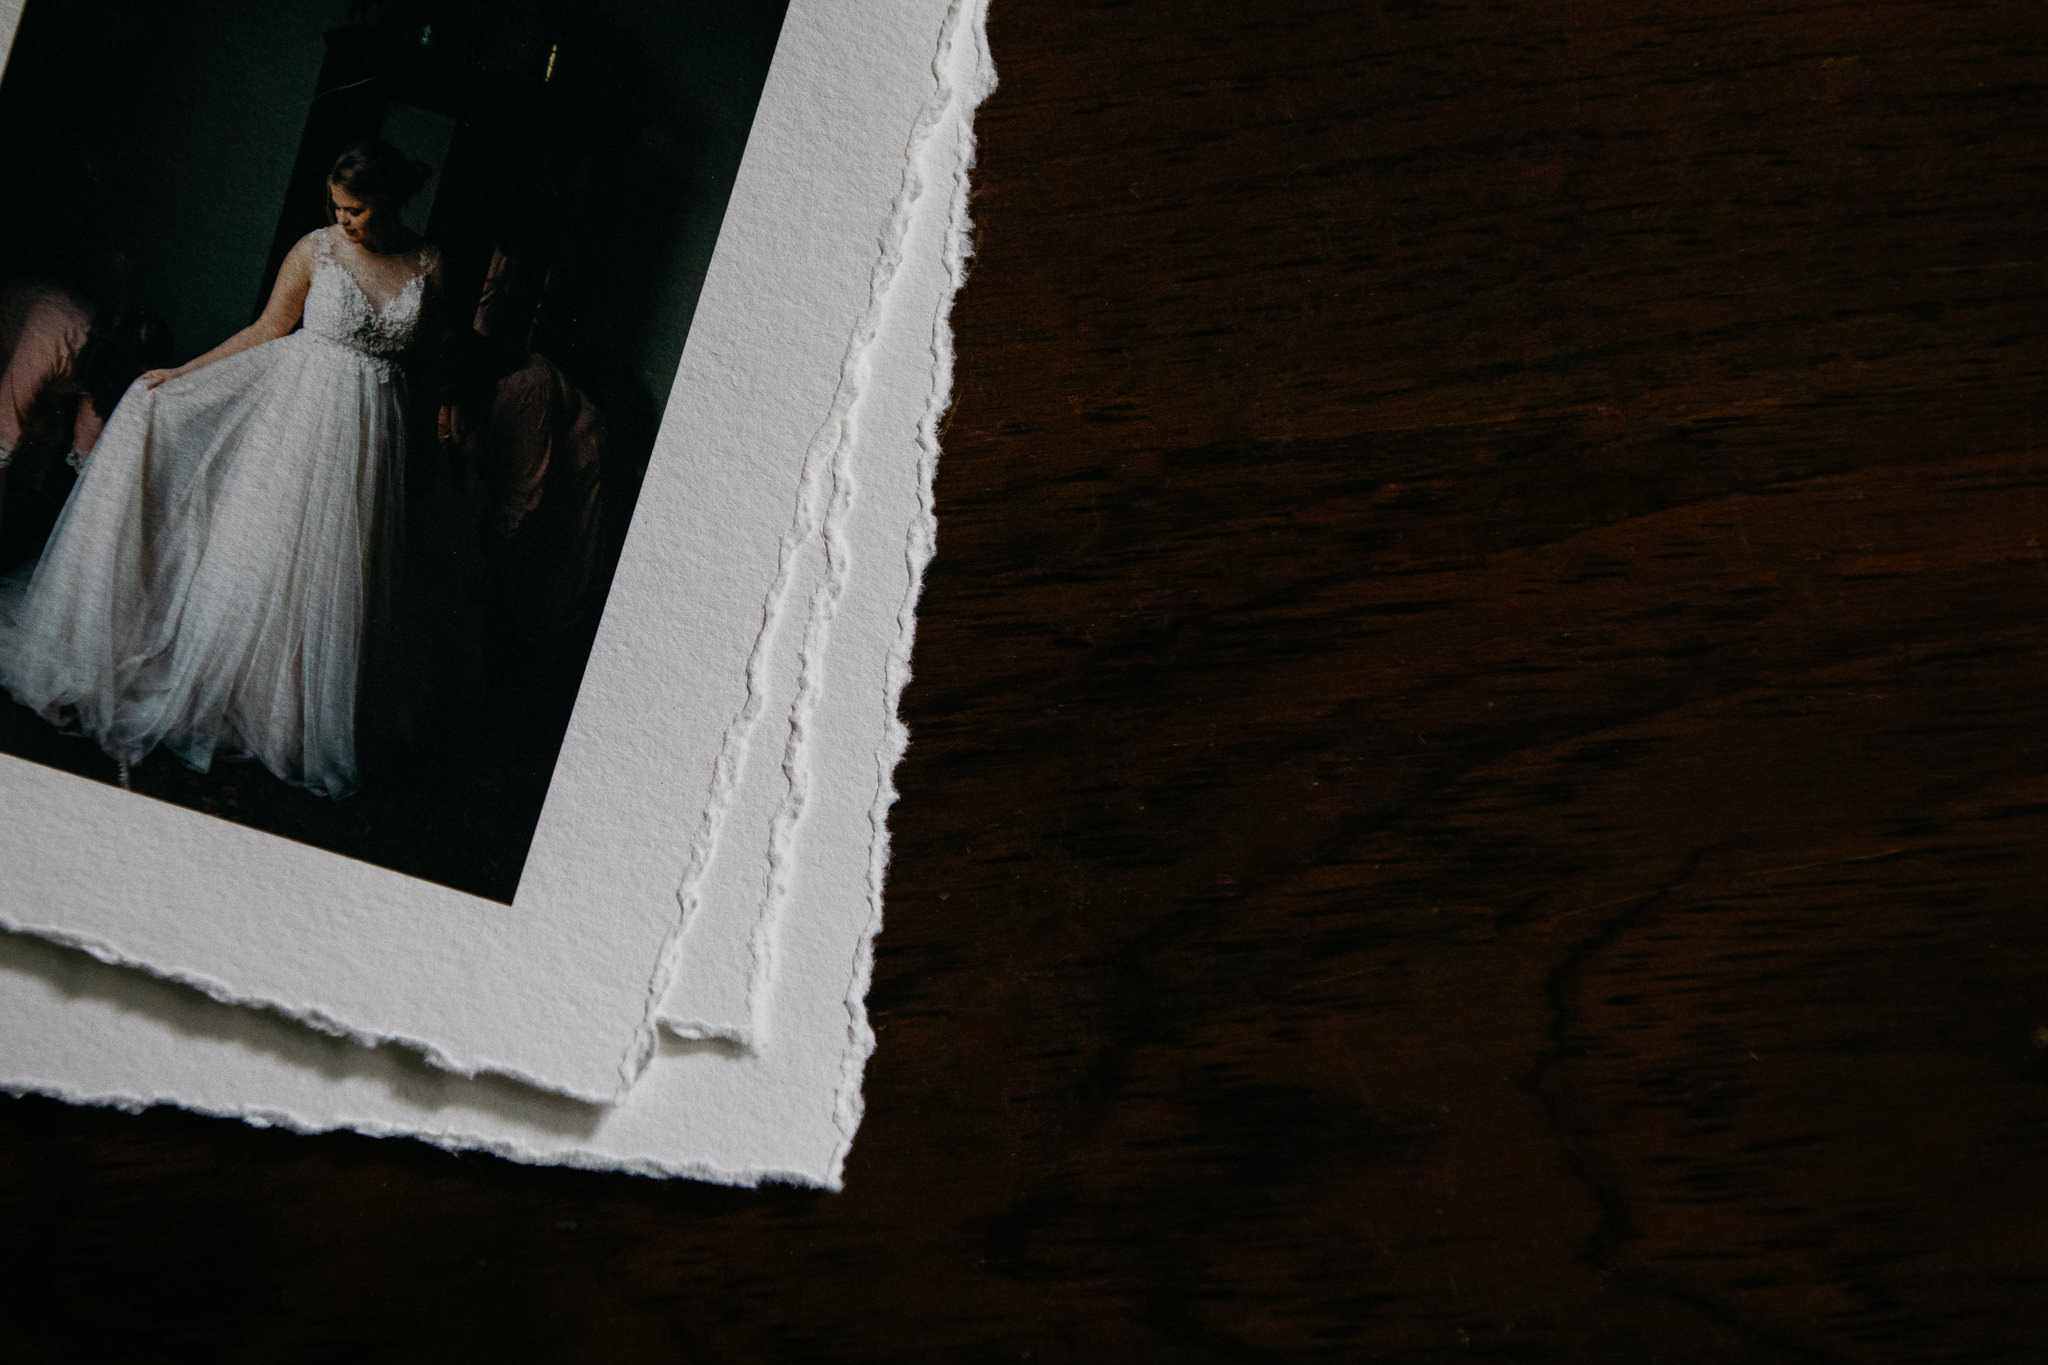 memphis-wedding-photographer-thewarmtharoundyou-5.jpg